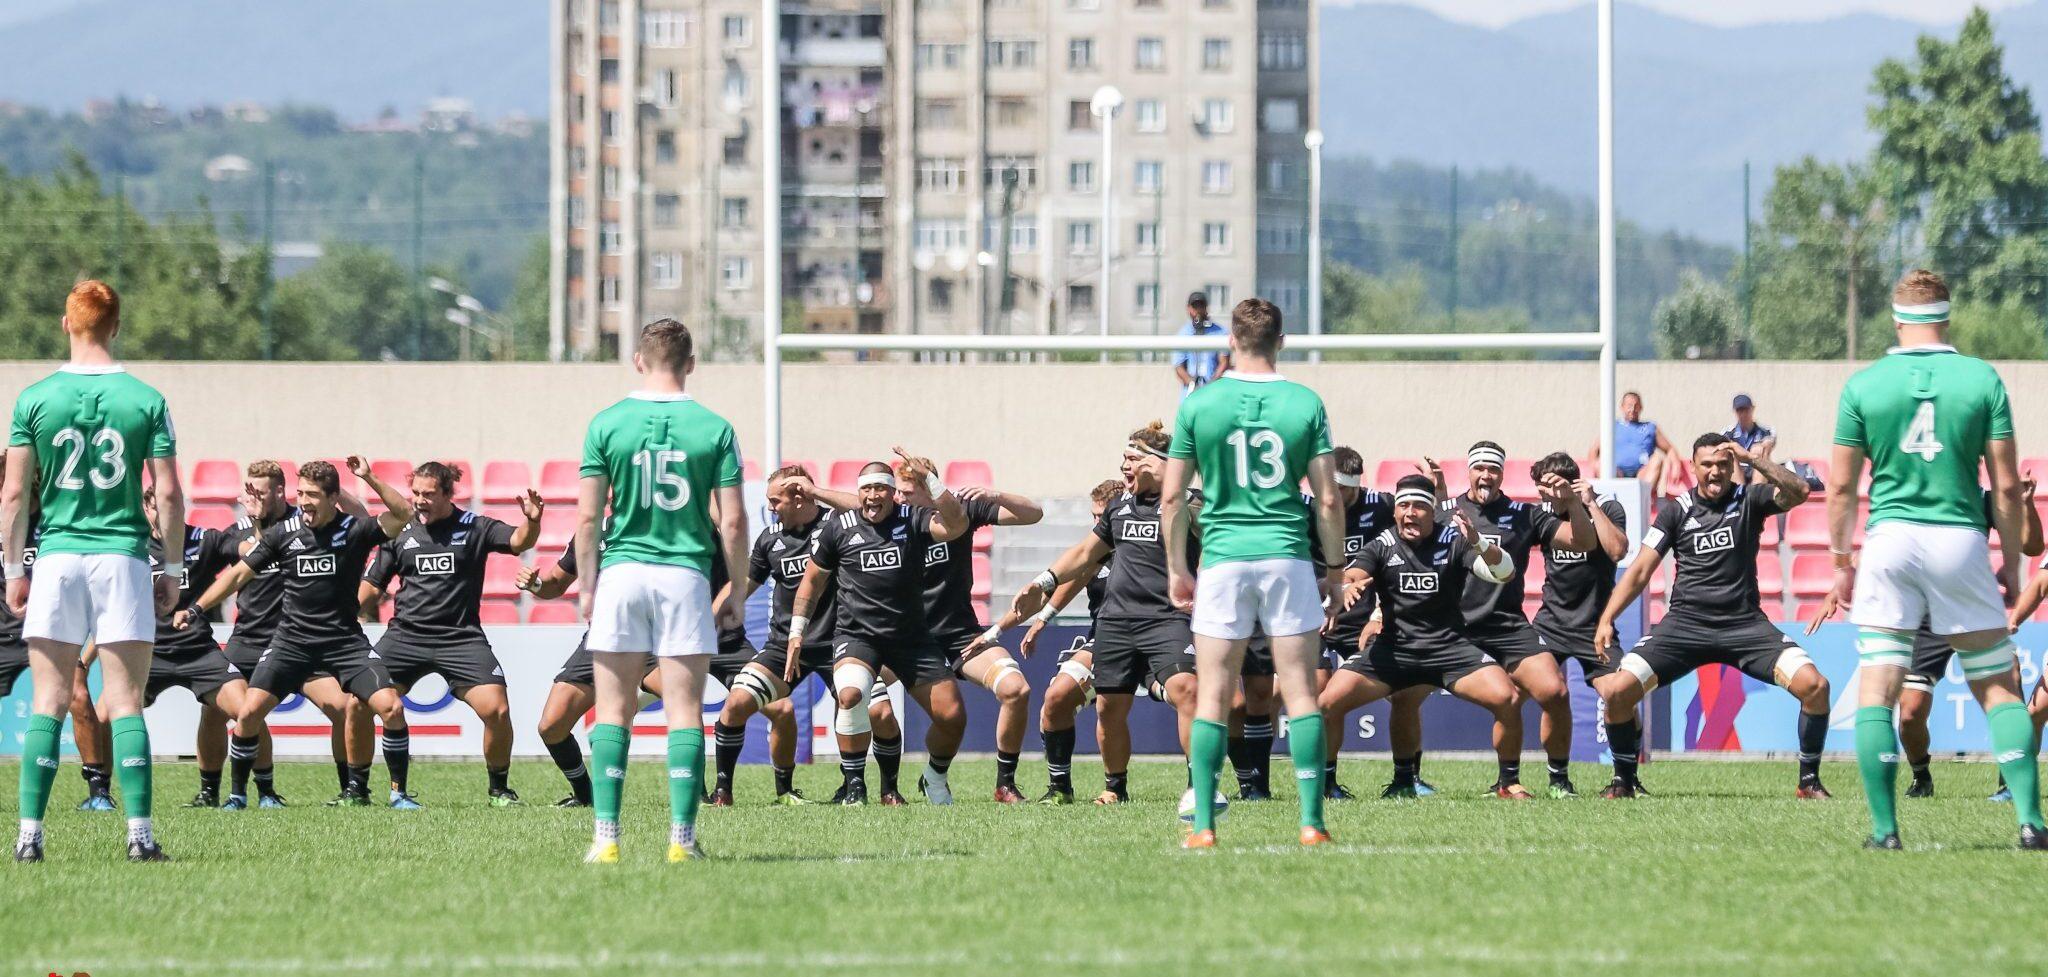 U20 Championship: Ireland U20 3 New Zealand U20 69